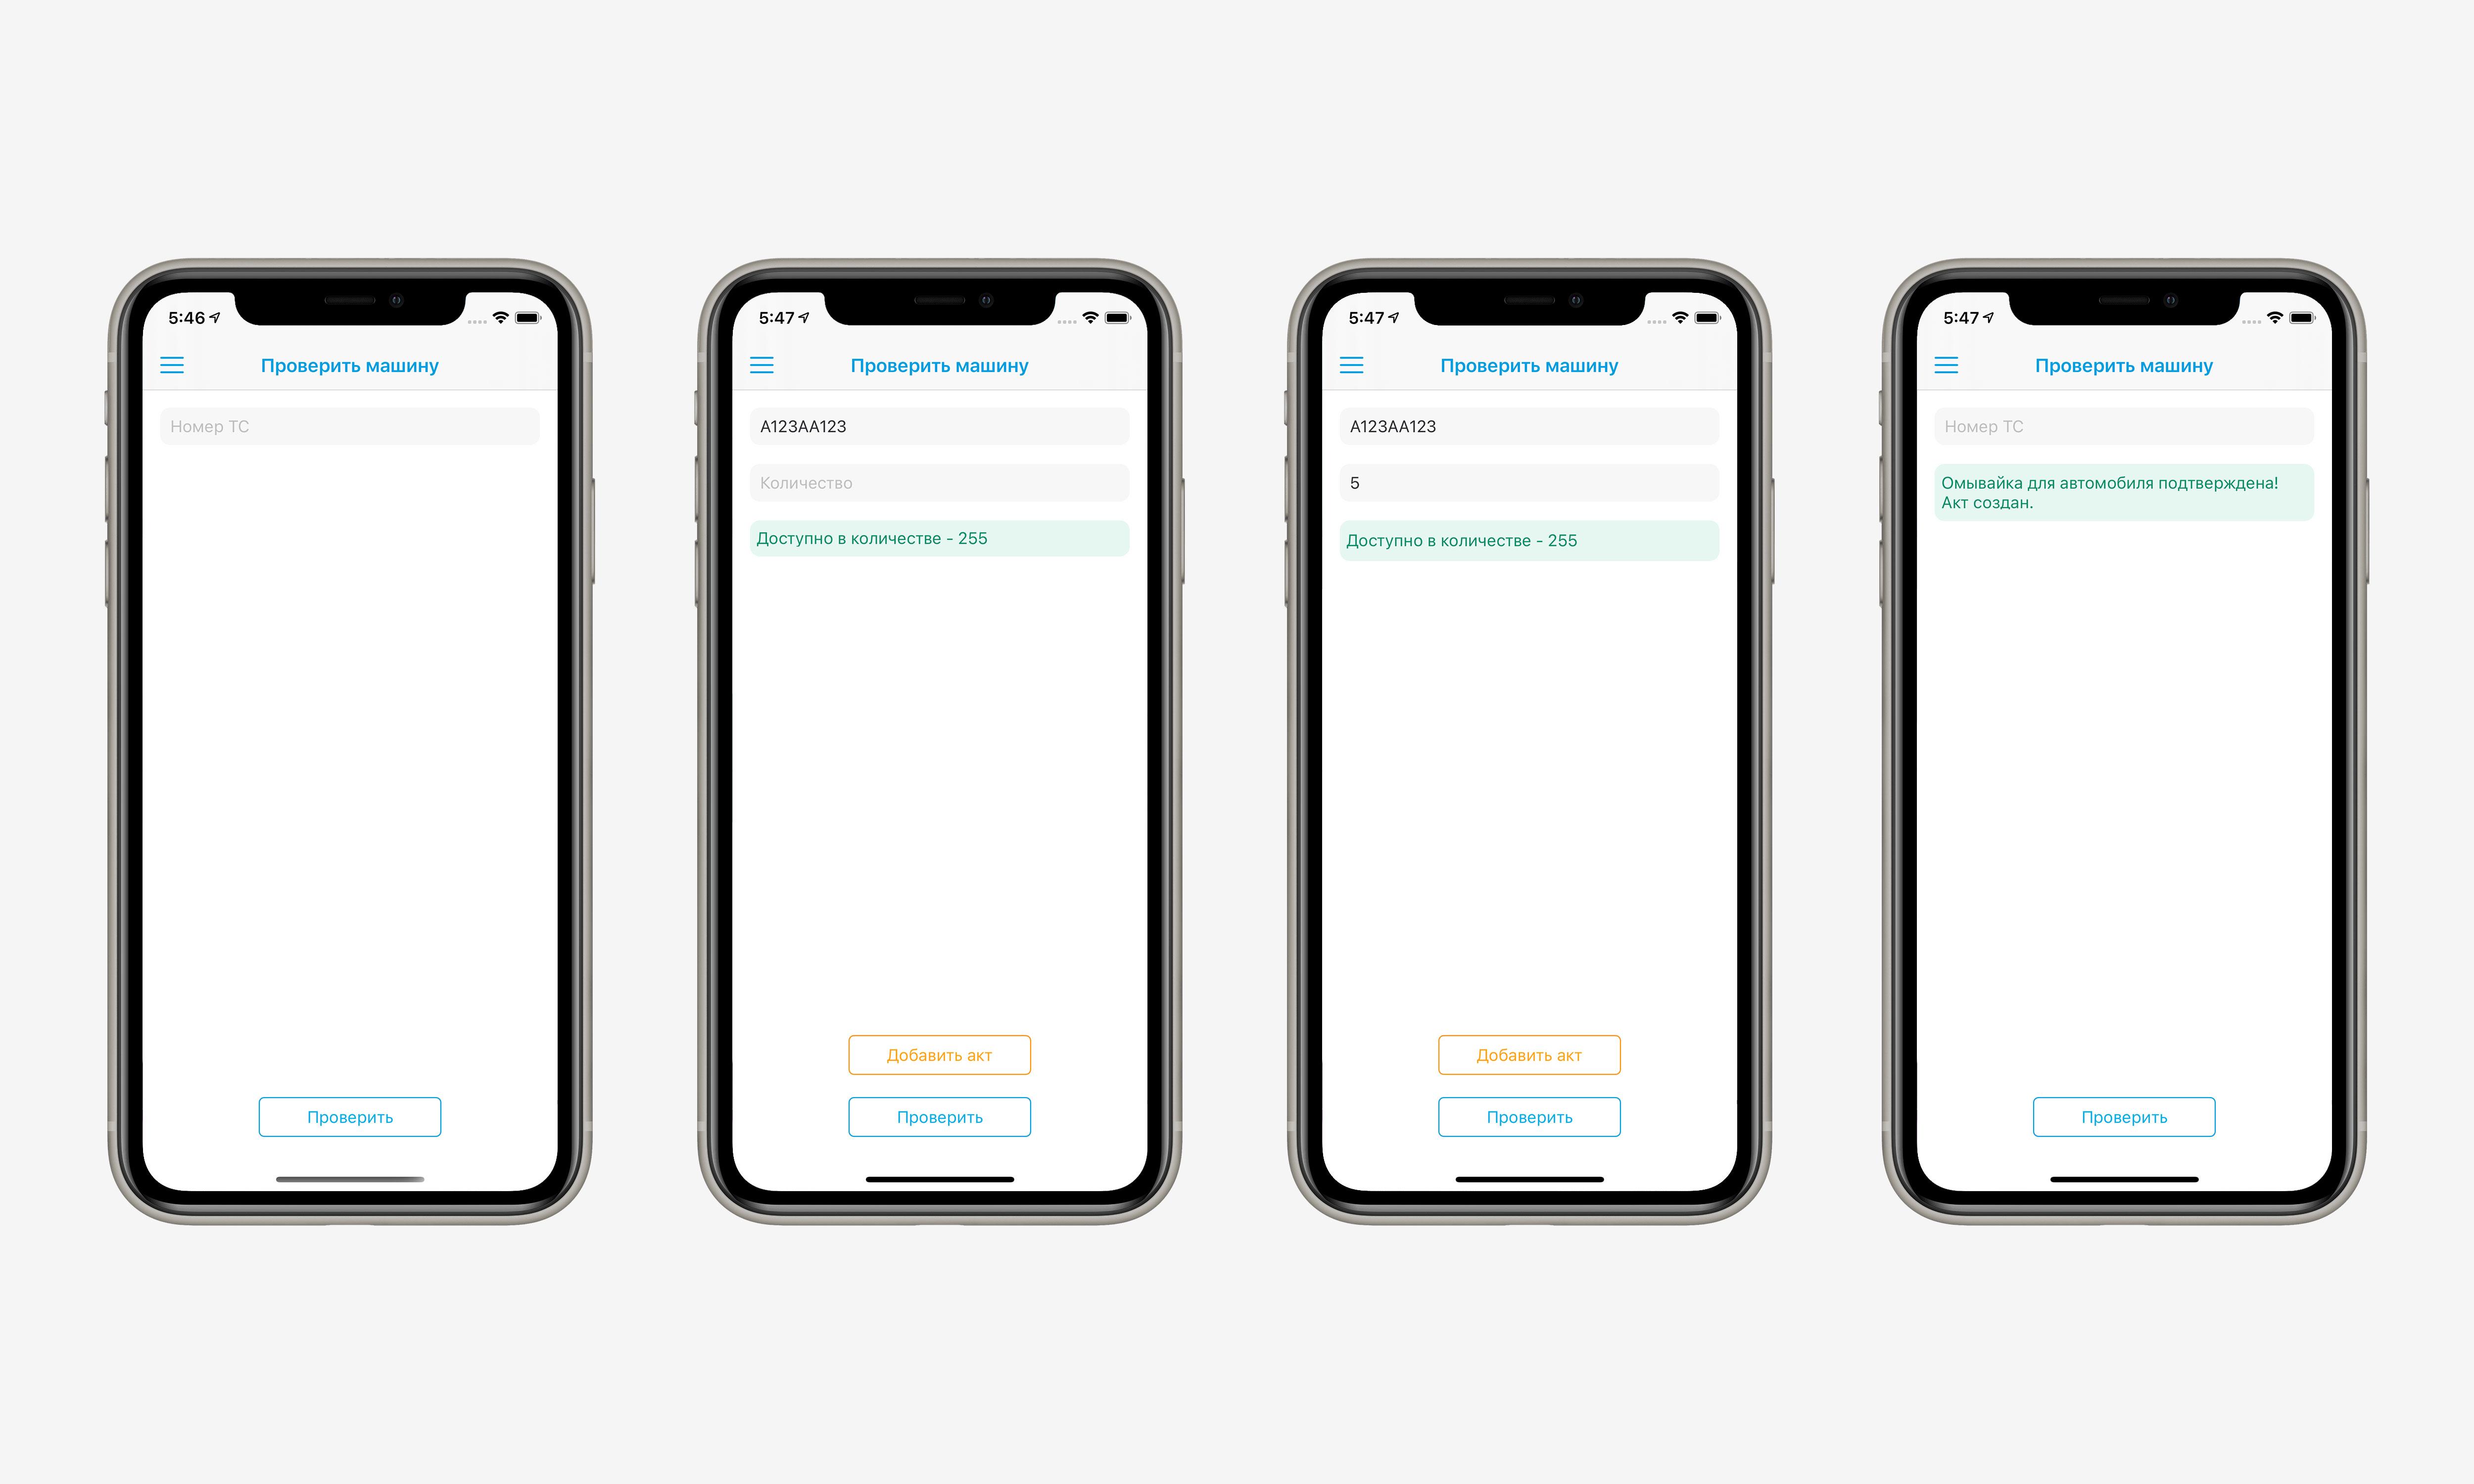 Доработка раздела проверки ТС в iOS